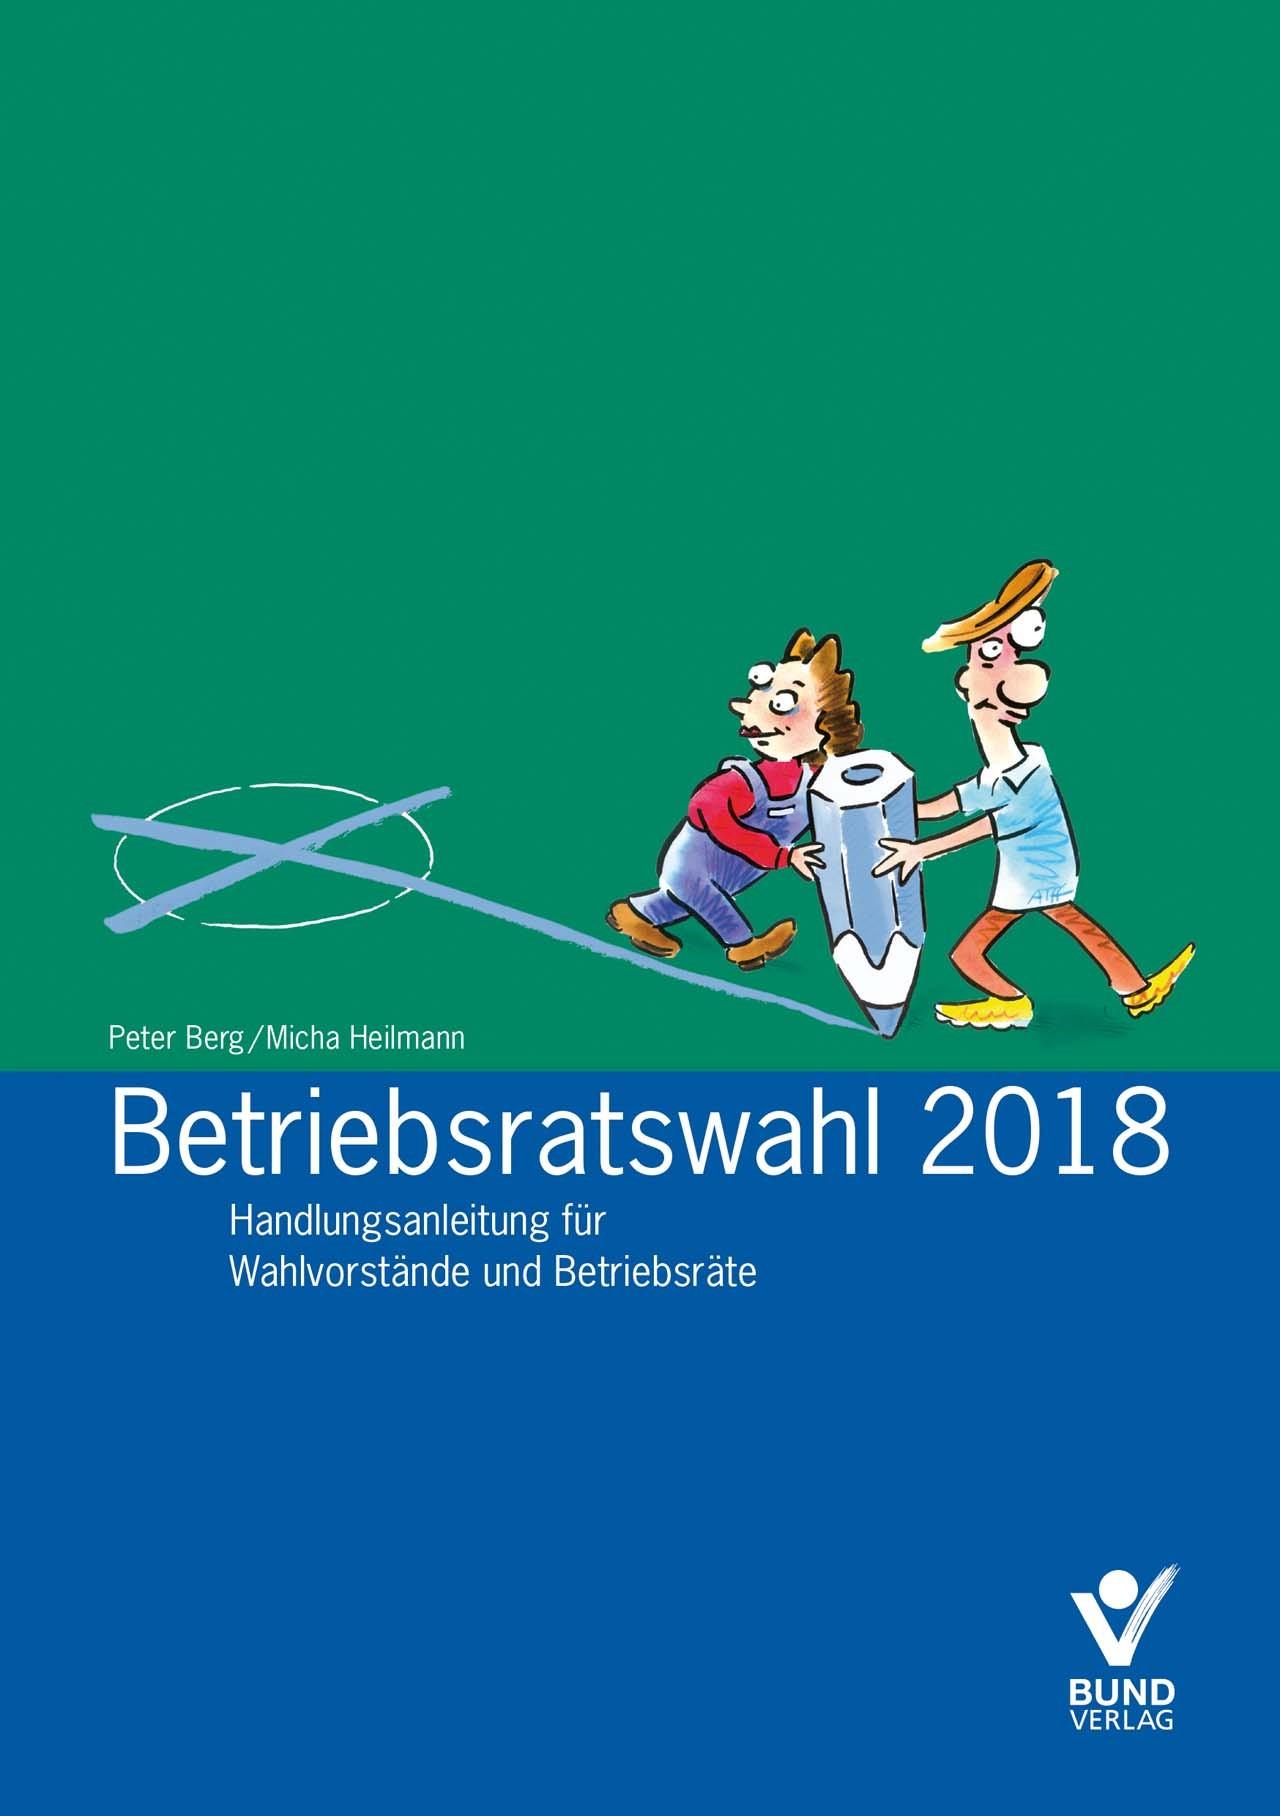 Betriebsratswahl 2018 | Heilmann / Berg, 2017 | Buch (Cover)